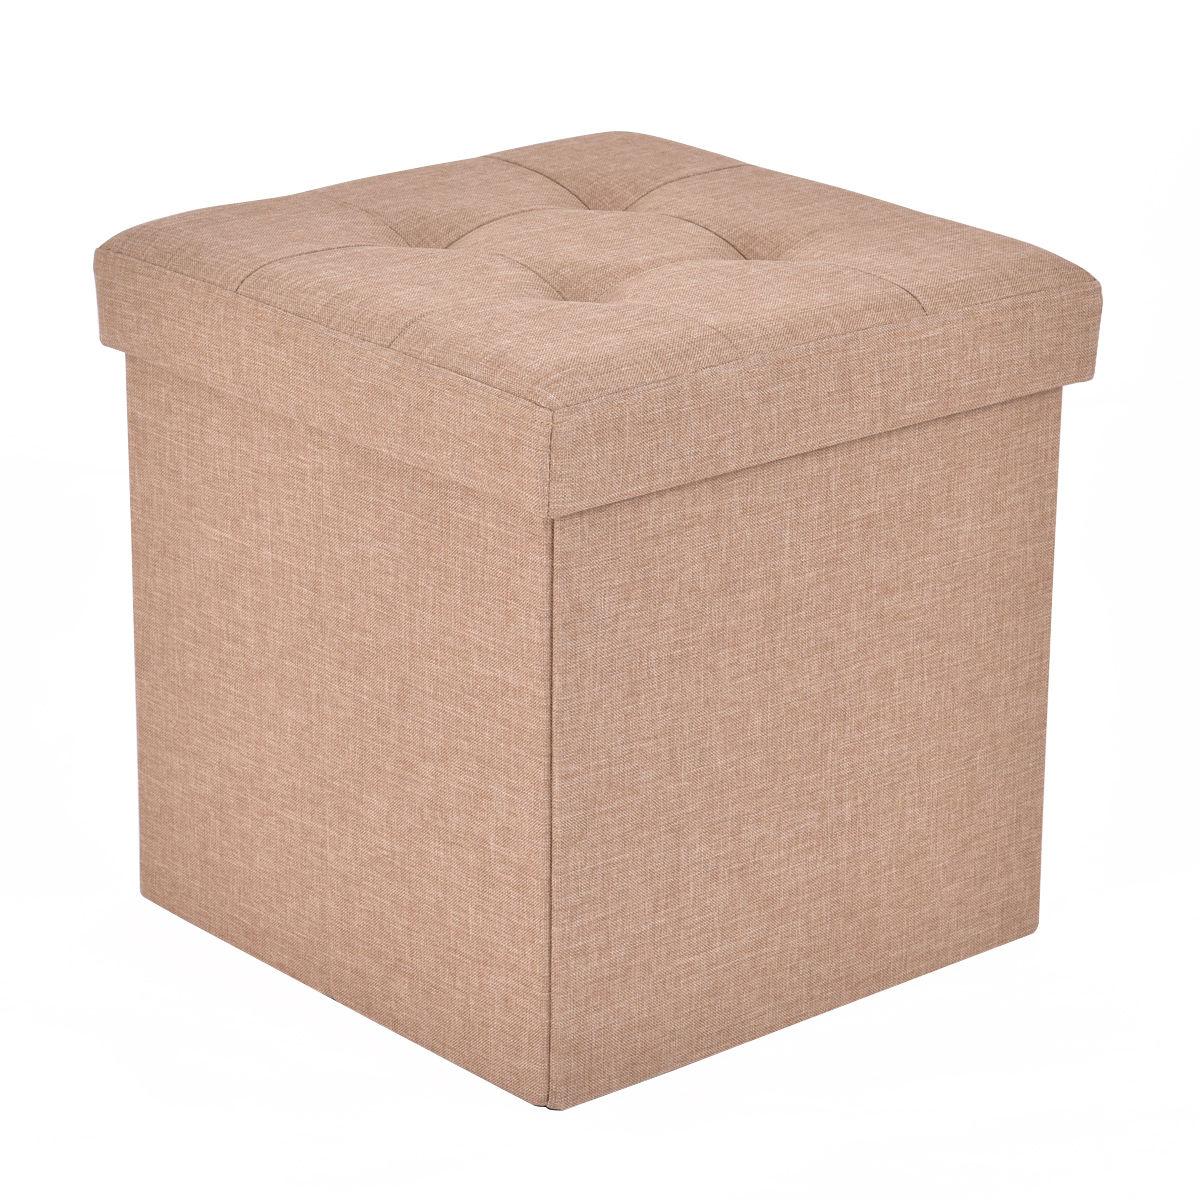 Cube Folding Ottoman Storage Seat - Beige